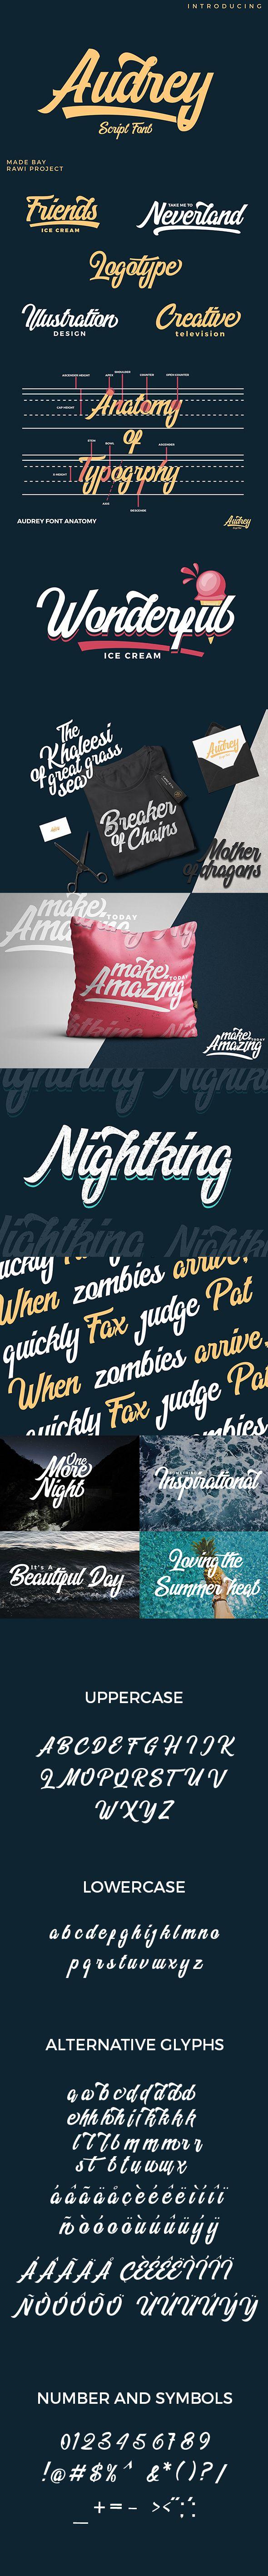 cursive fonts for wedding cards%0A Audrey Script Font